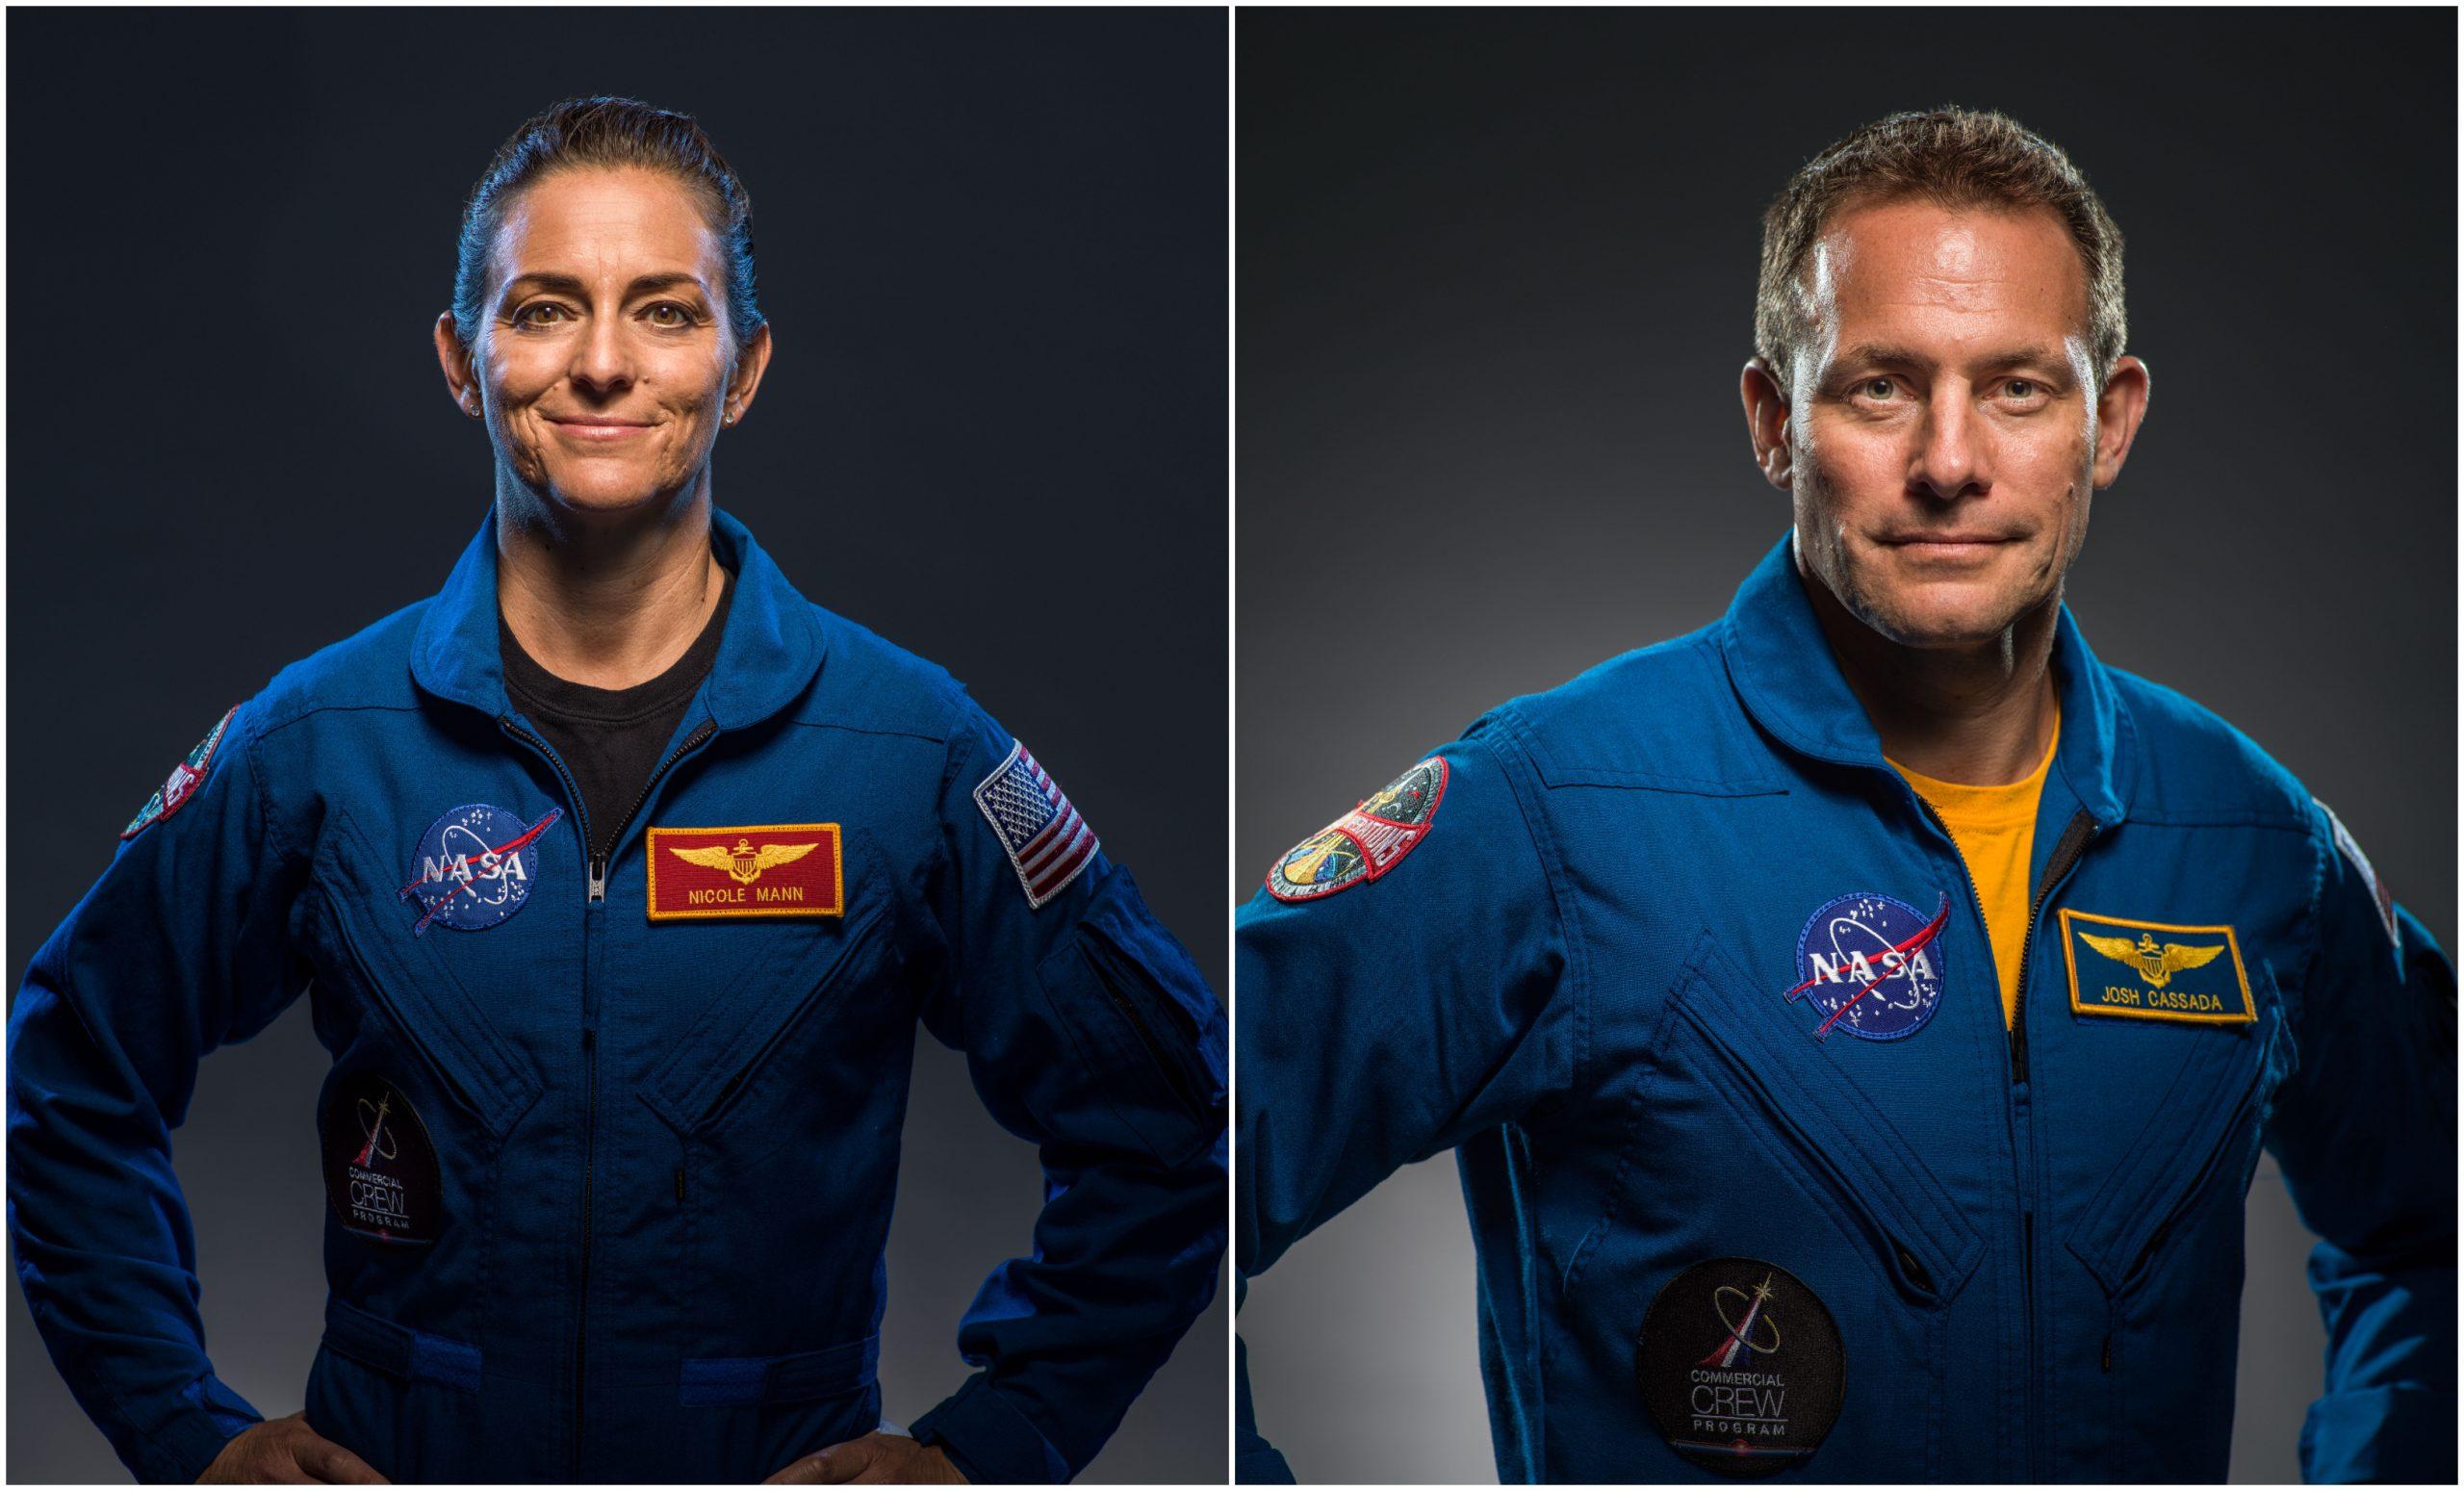 NASA astronauts Nicole Mann, left, and Josh Cassada, right.